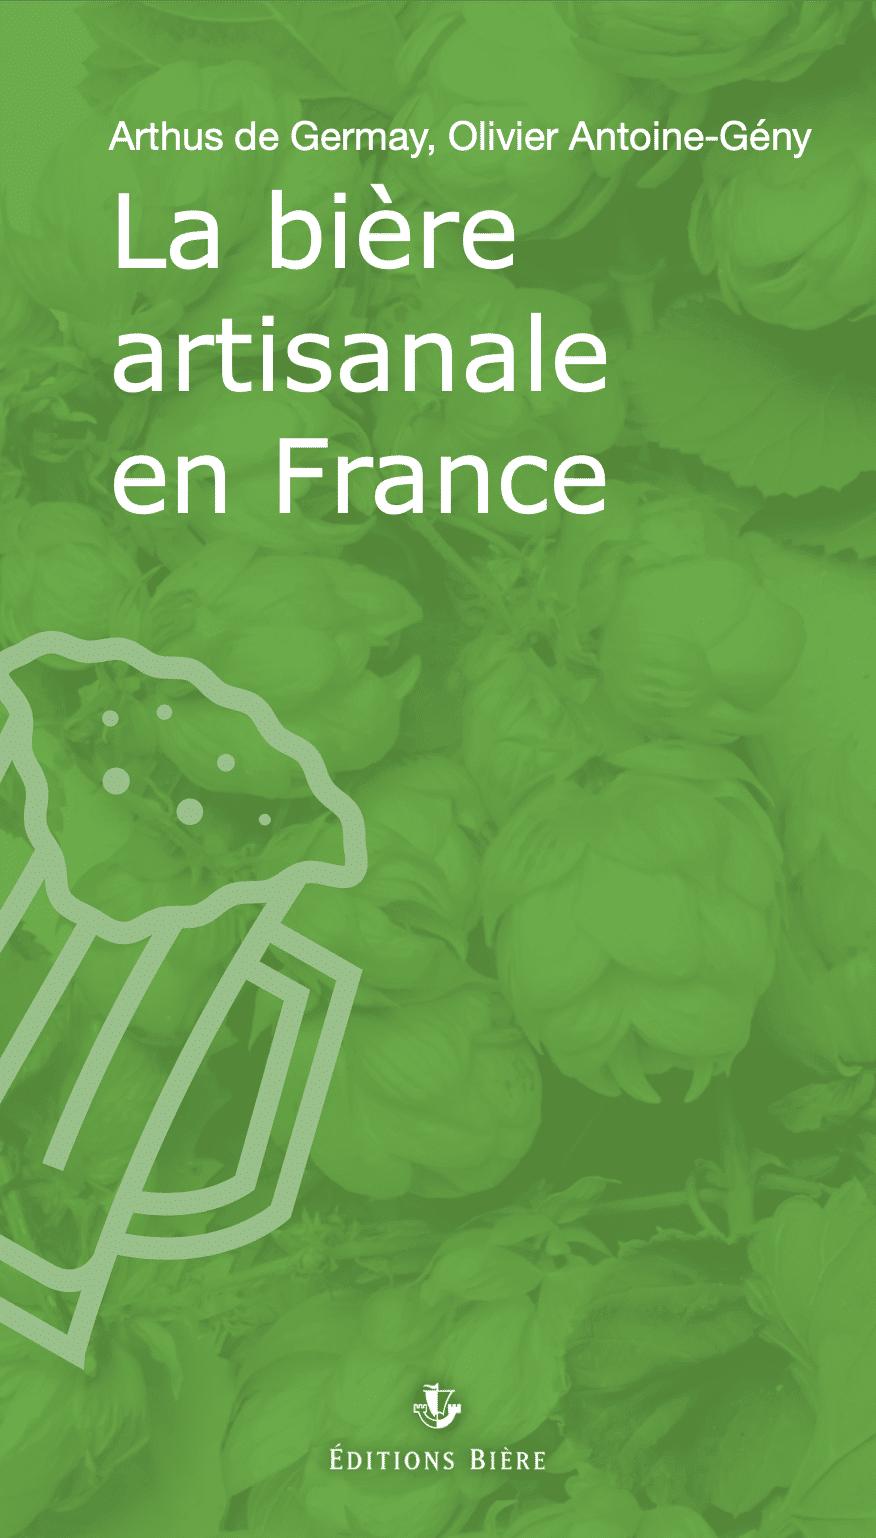 La bière artisanale en France